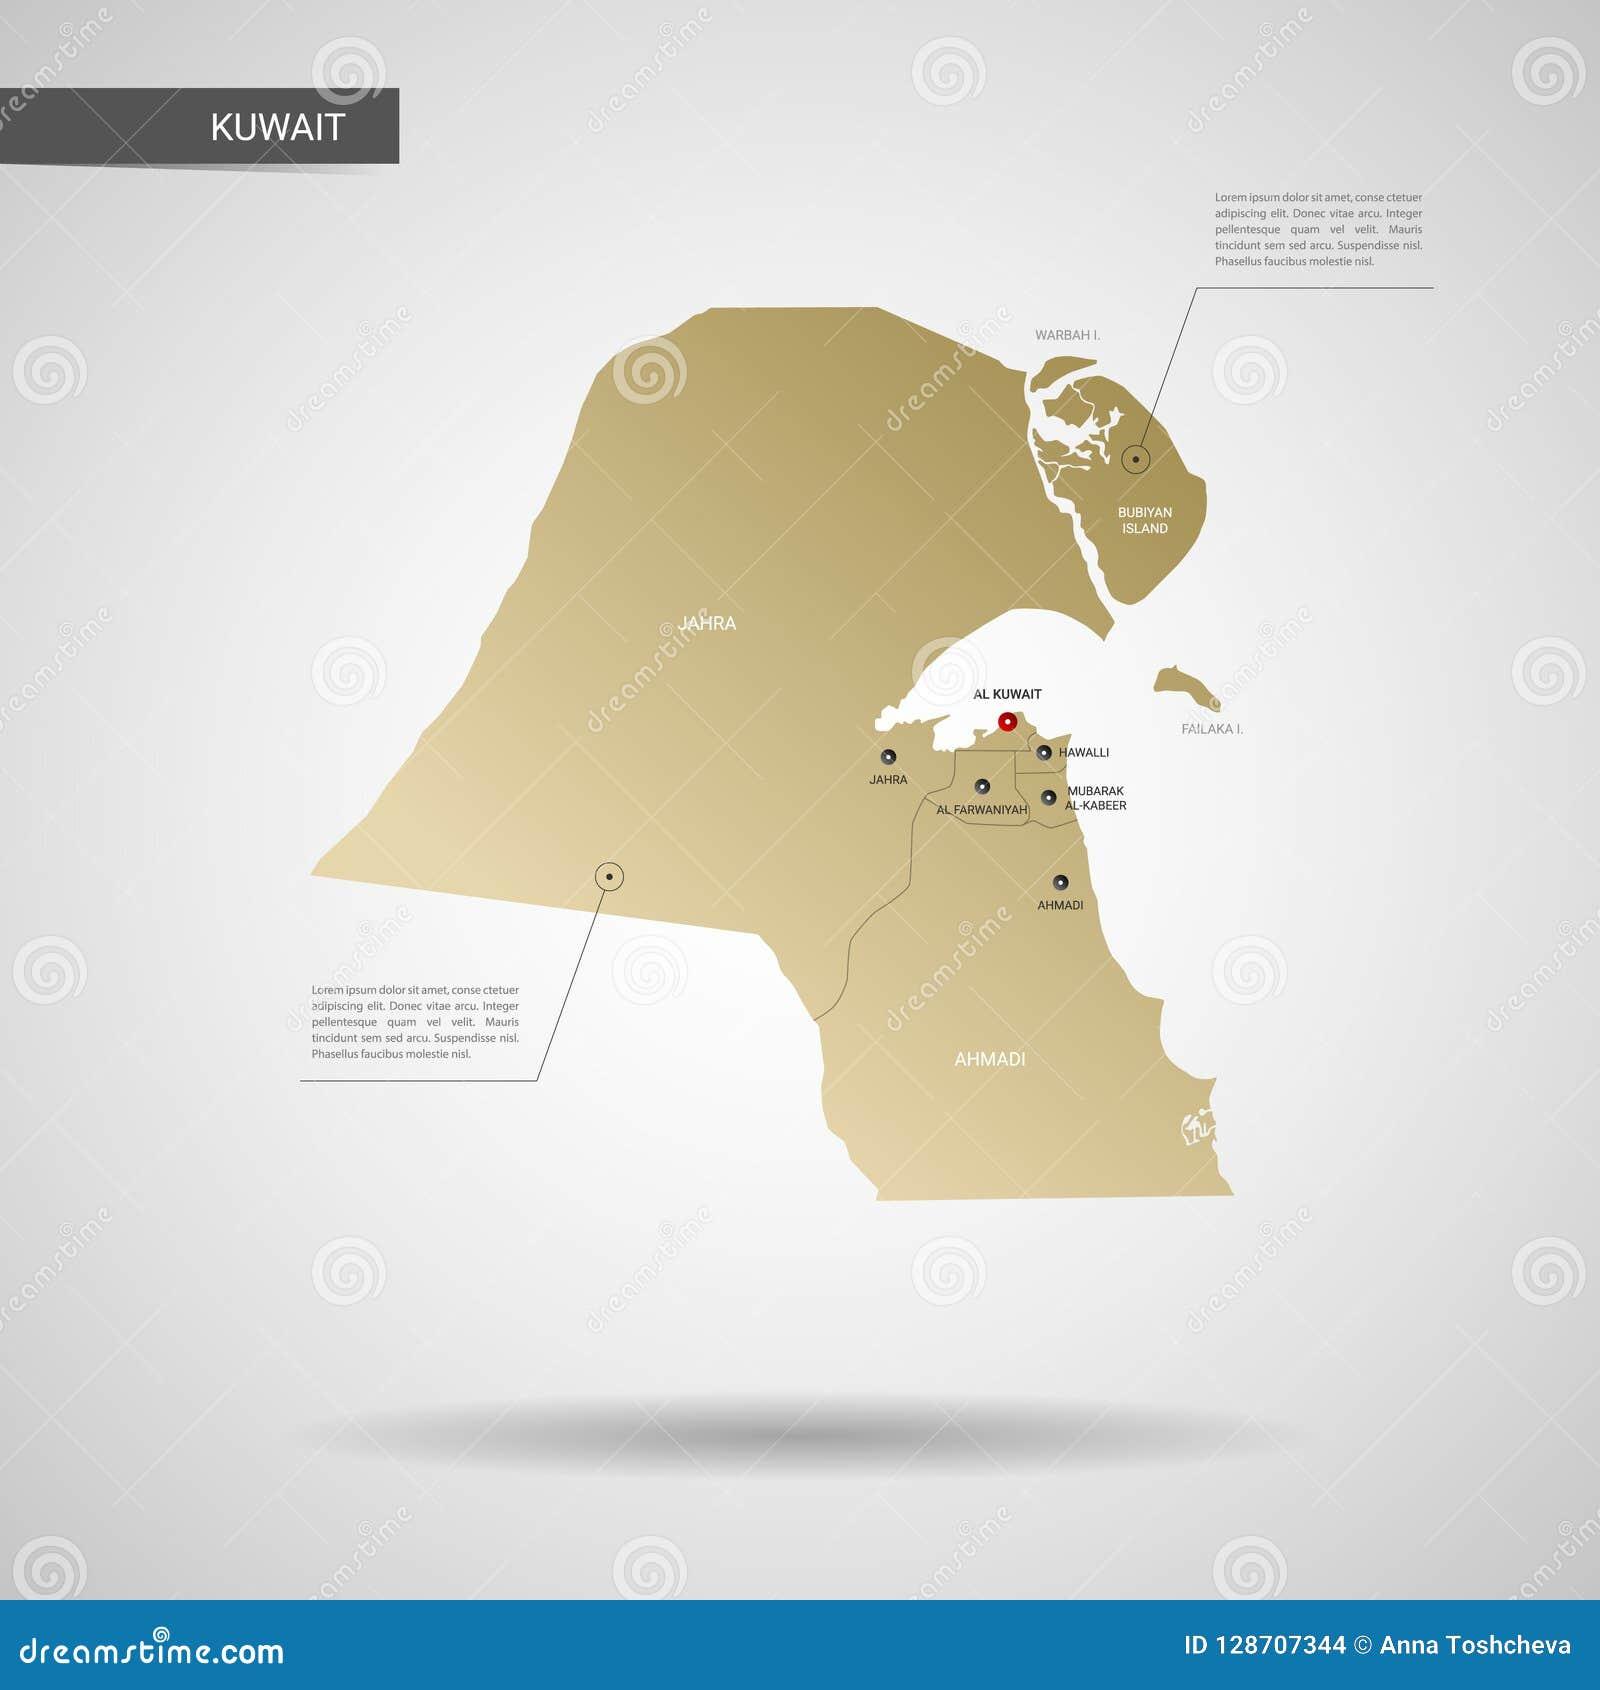 Stylized Kuwait Map Vector Illustration. Stock Vector ...